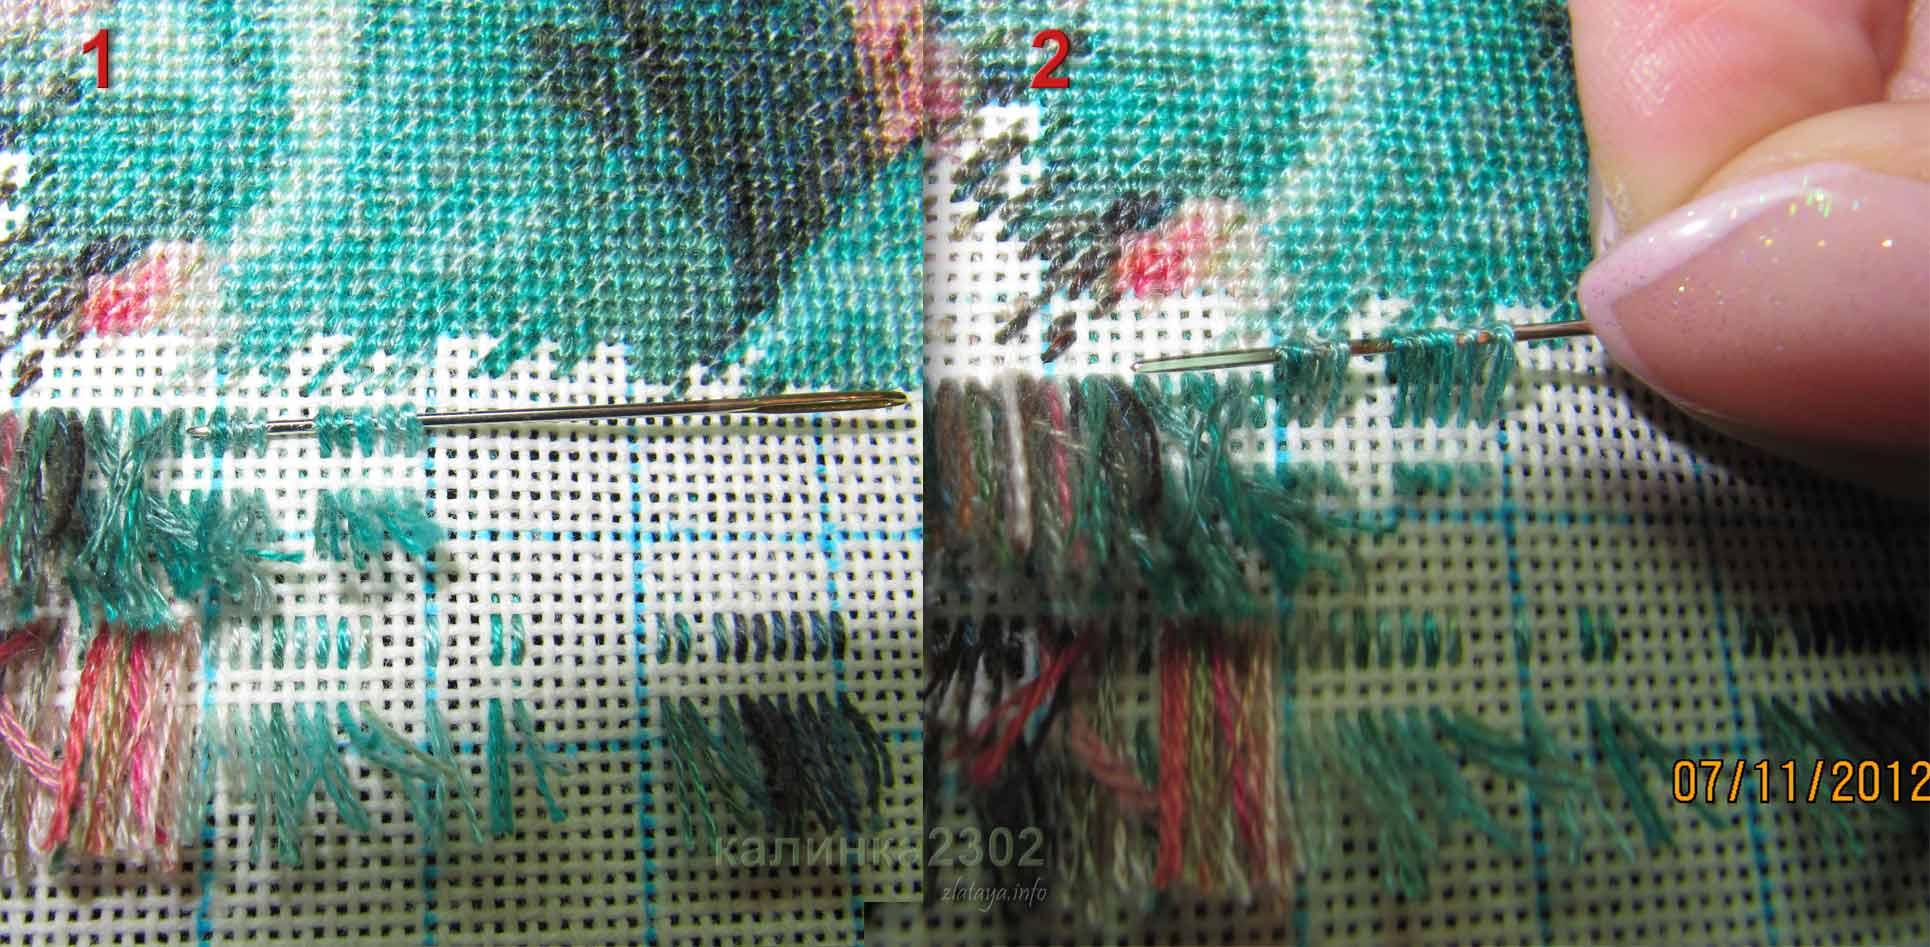 Вышивка чистая изнанка 4